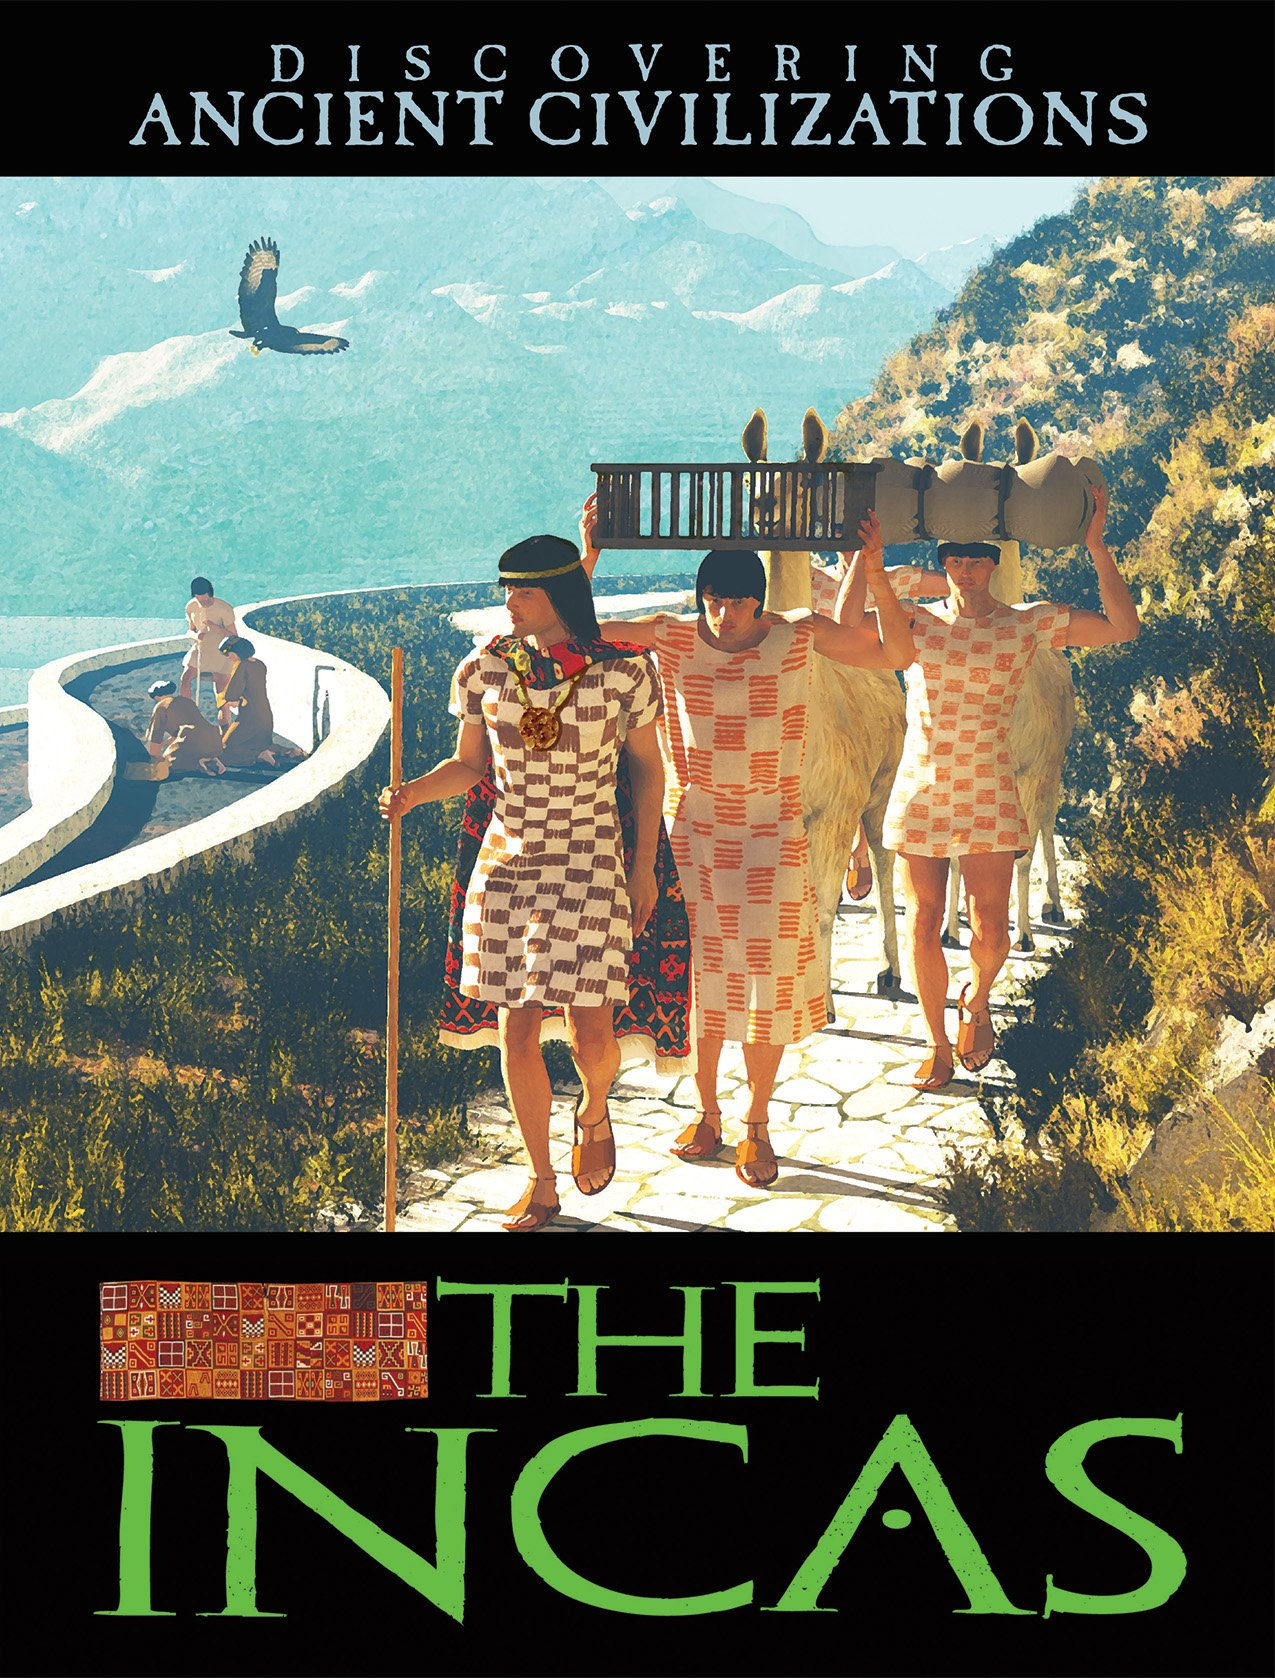 The Incas (Discovering Ancient Civilizations)